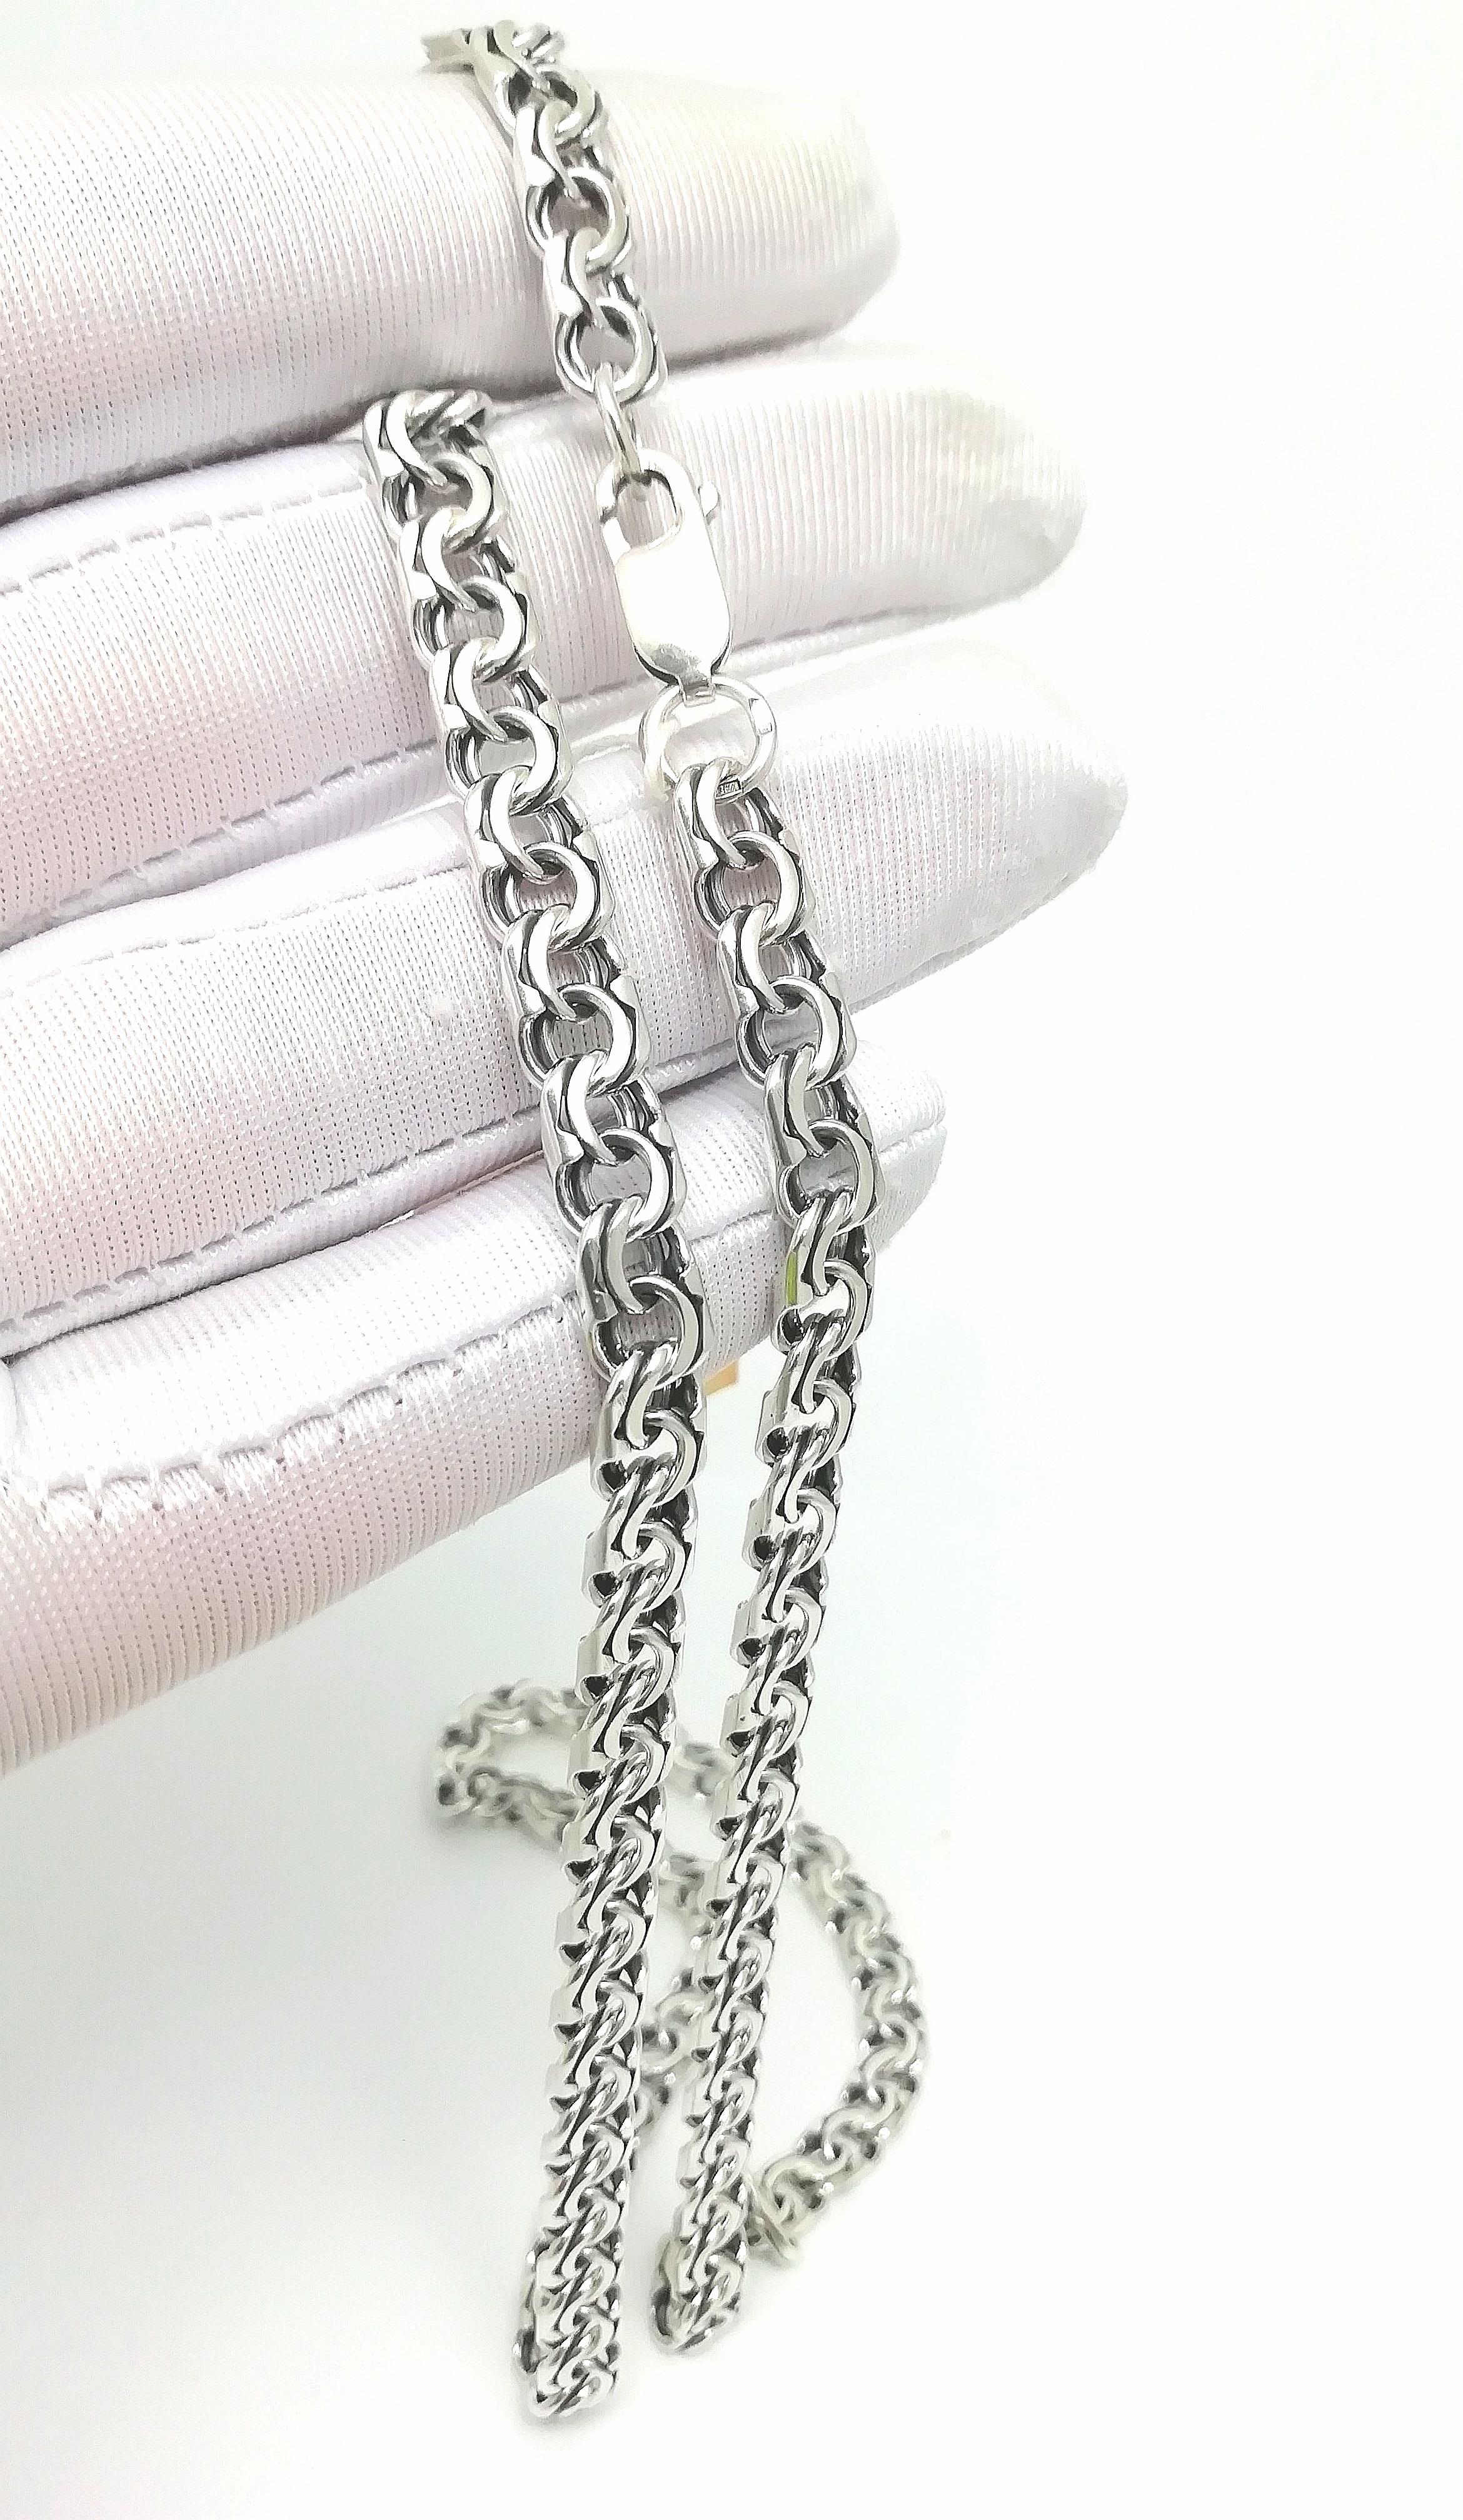 Серебро цепь дк240920-146 36,20гр